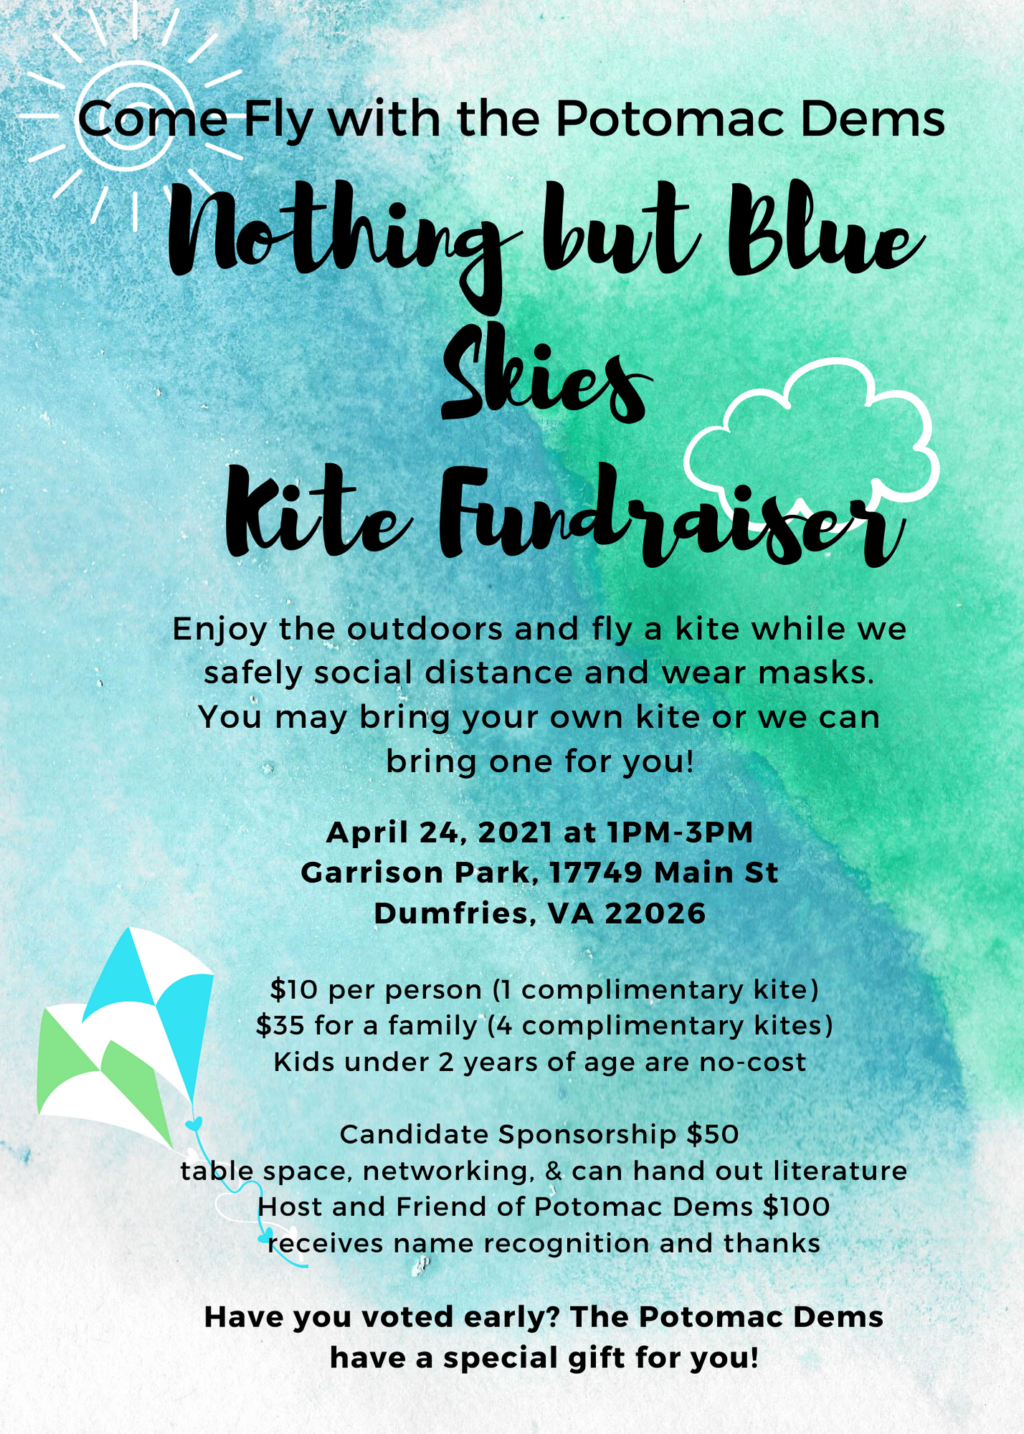 Potomac Nothing But Blue Skies Kite Fundraiser